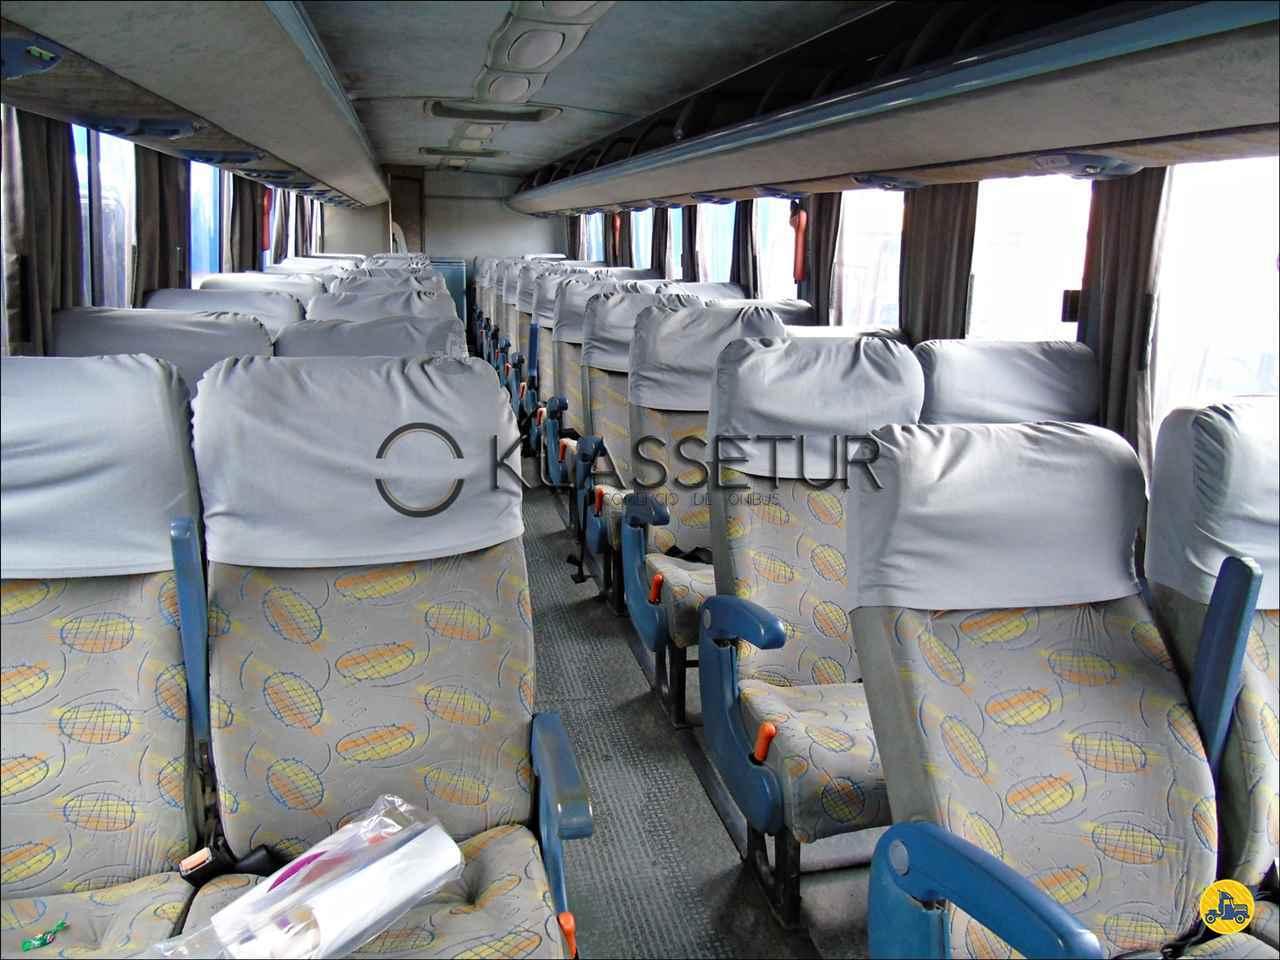 COMIL Campione 3.25  2002/2002 Klassetur Comércio de Ônibus